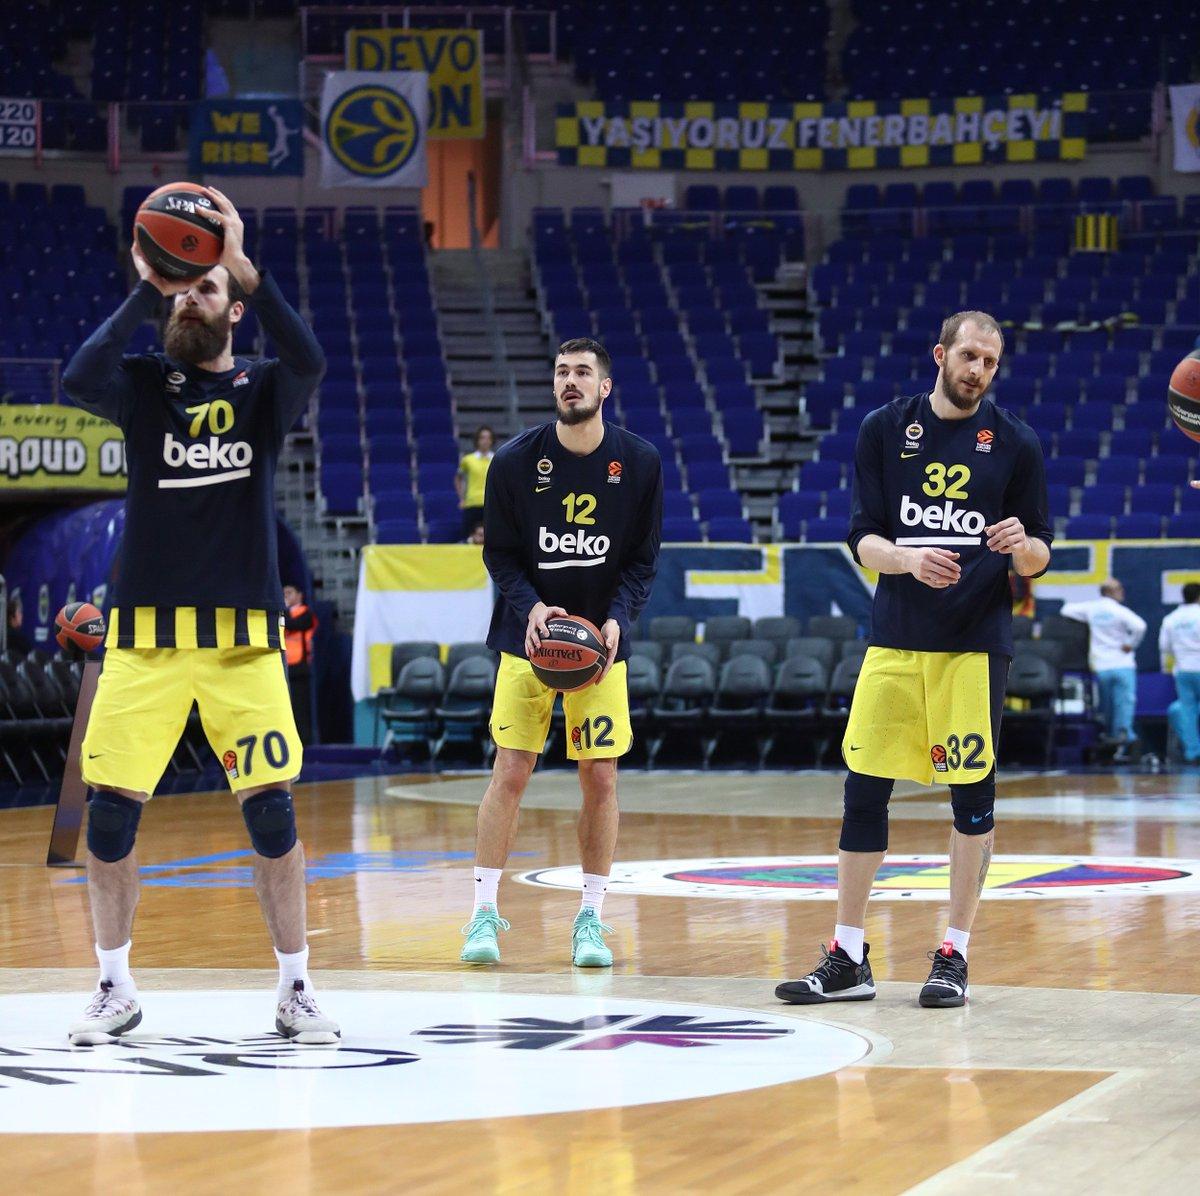 Fenerbahçe Beko's photo on Sloukas